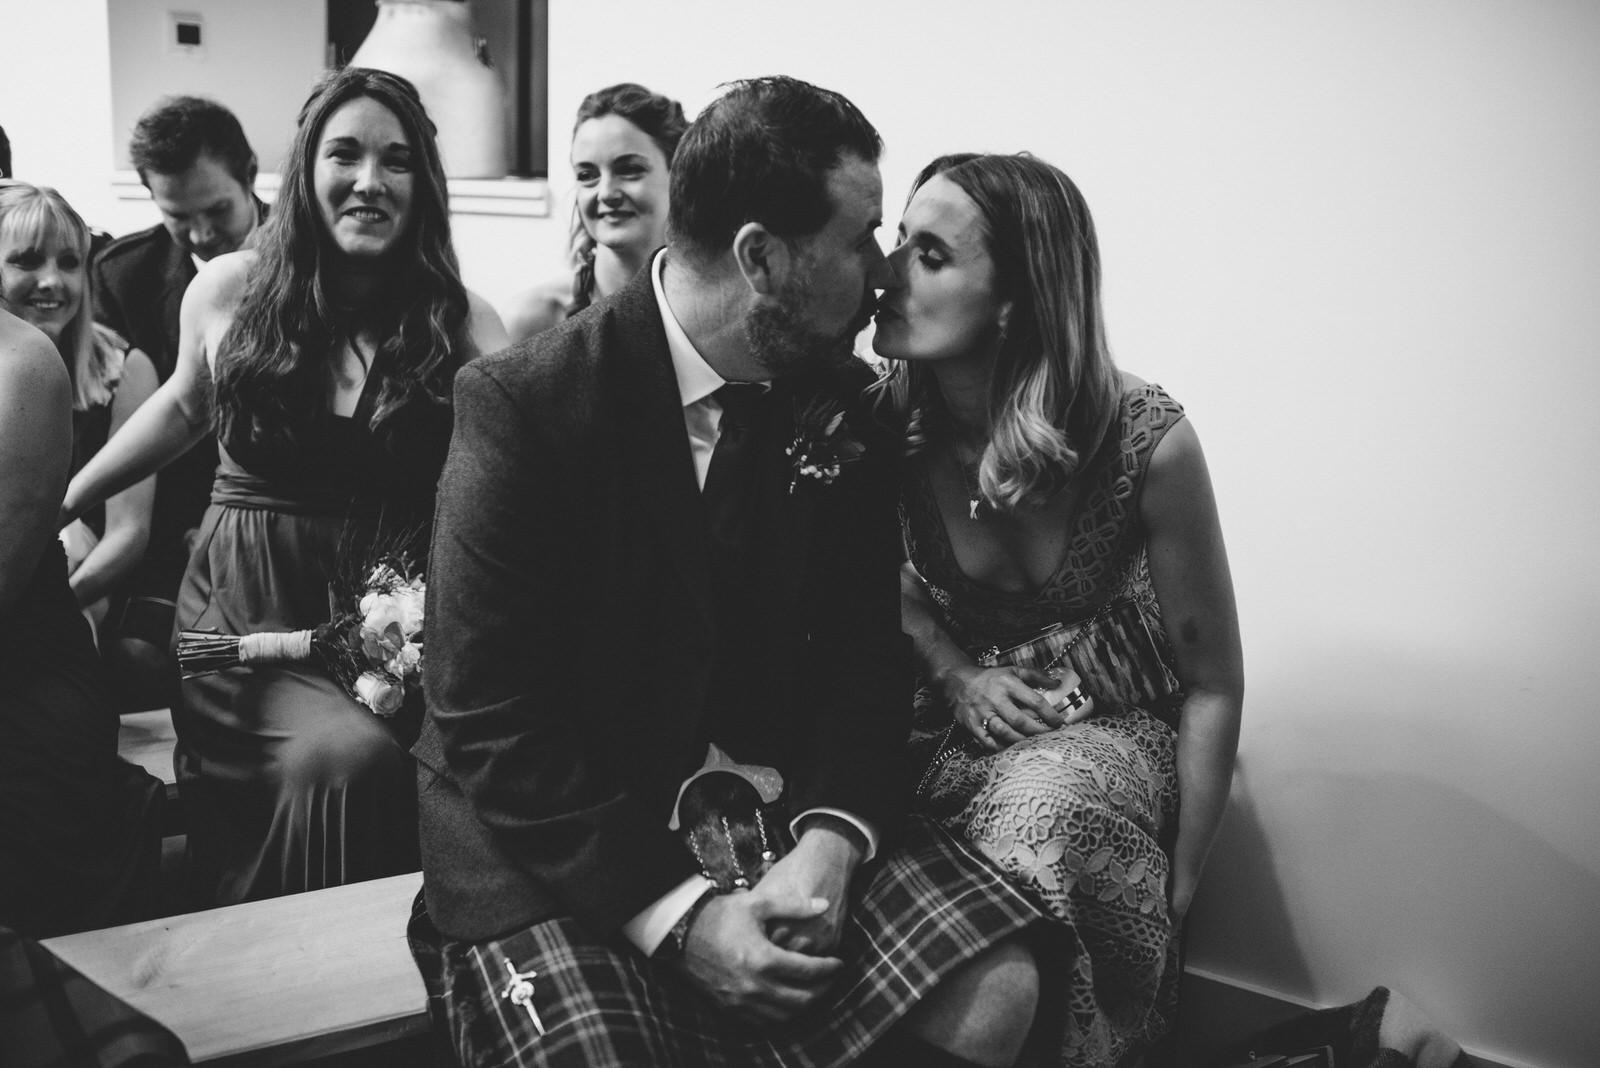 028-GUARDSWELL-FARM-WEDDING-ALTERNATIVE-SCOTTISH-WEDDING-PHOTOGRAPHER-SCOTTISH-WEDDING-DESTINATION-WEDDING-PHOTOGRAPHER.JPG